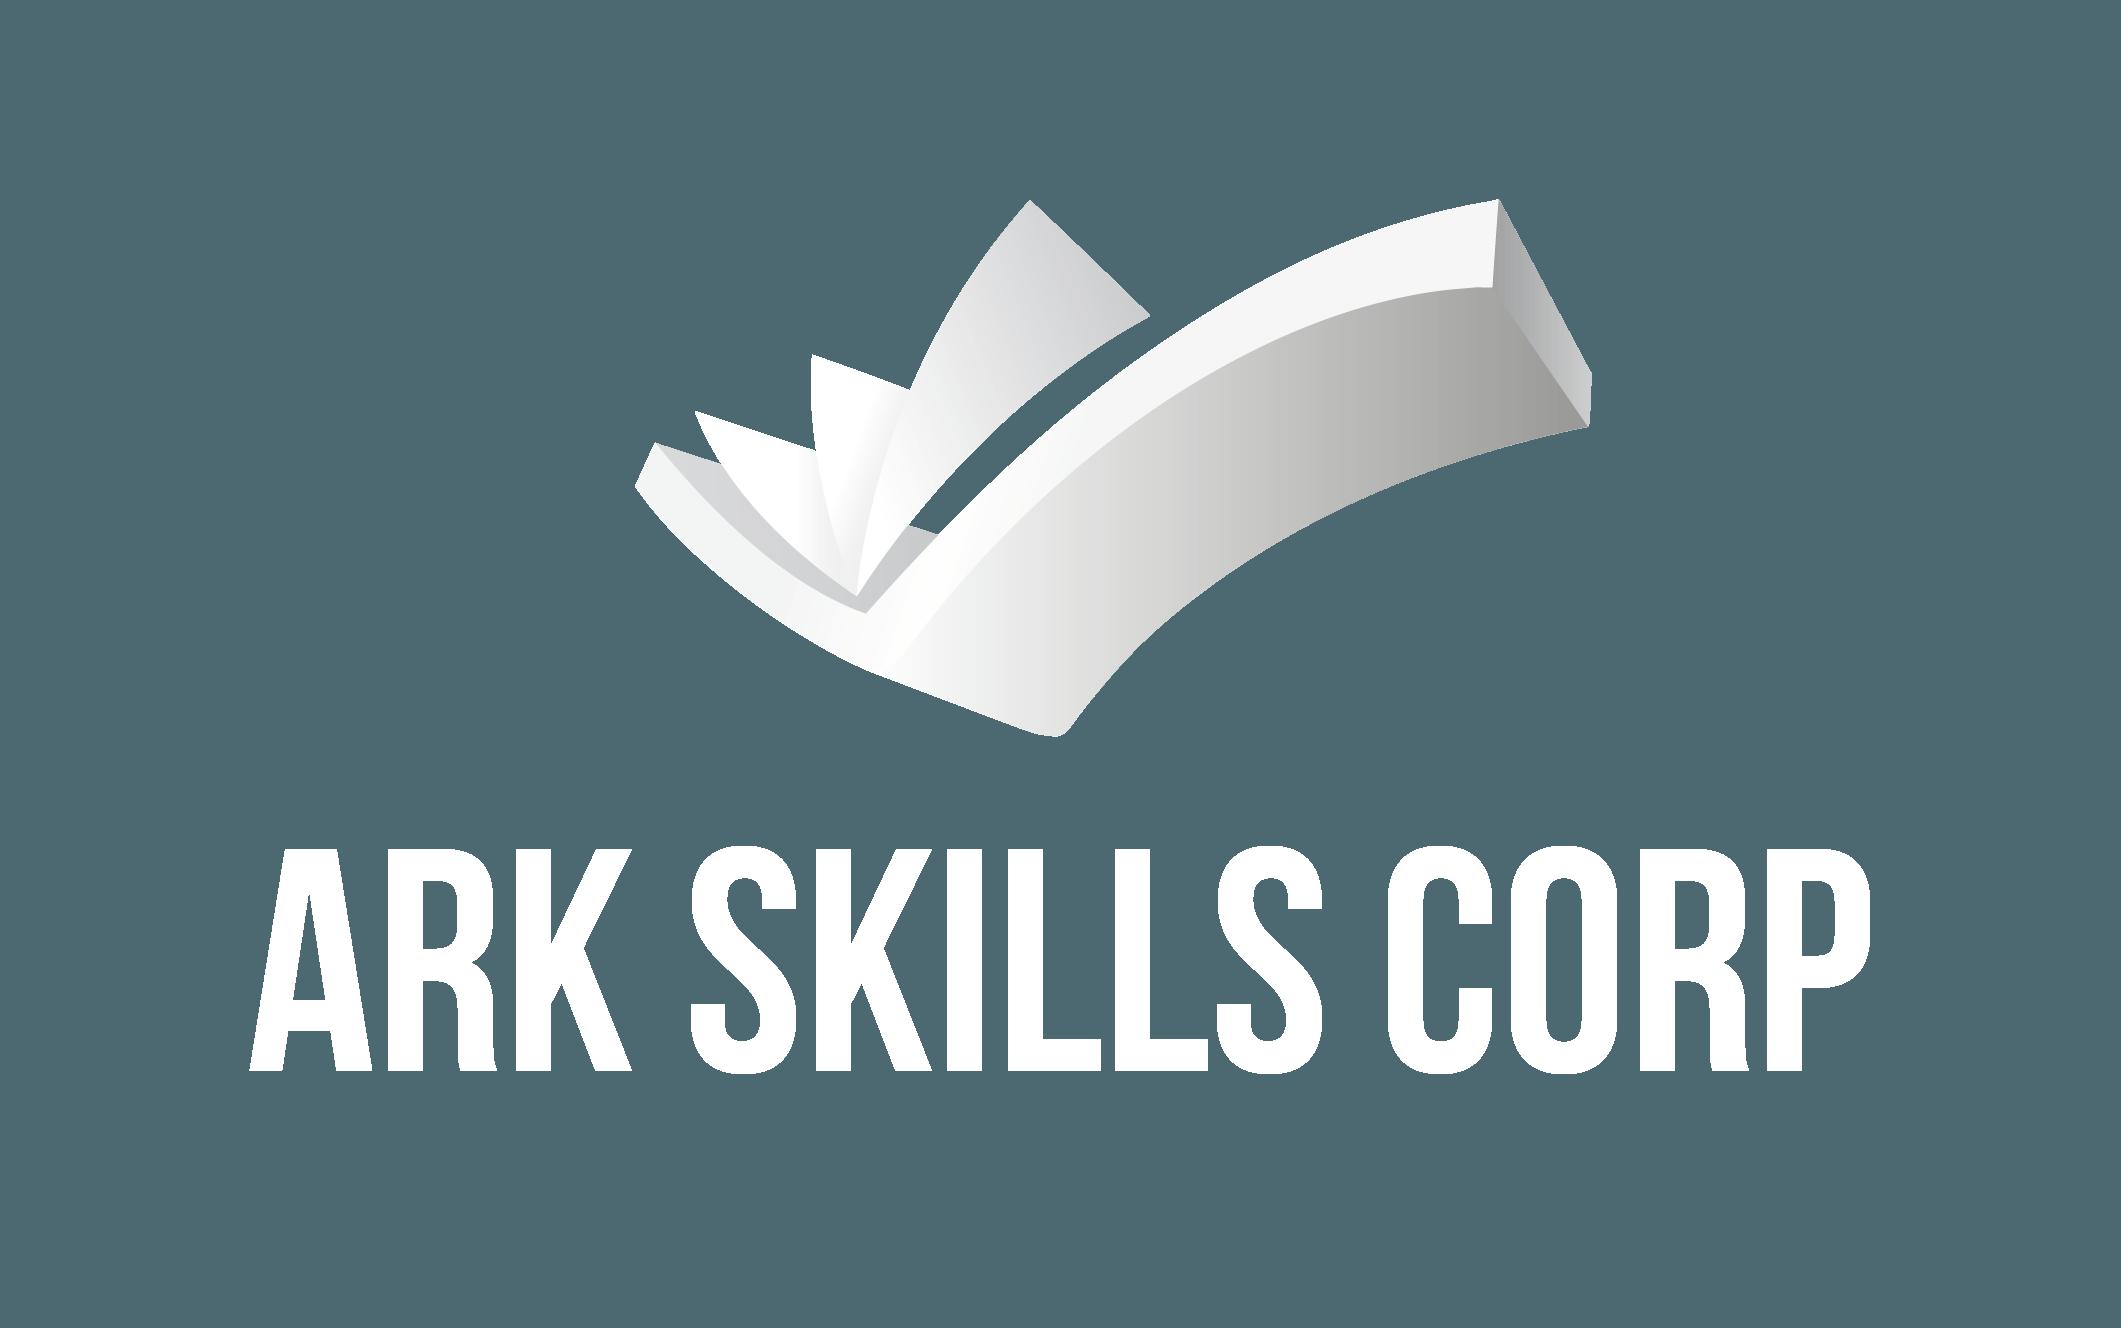 ARK Skills Corp.